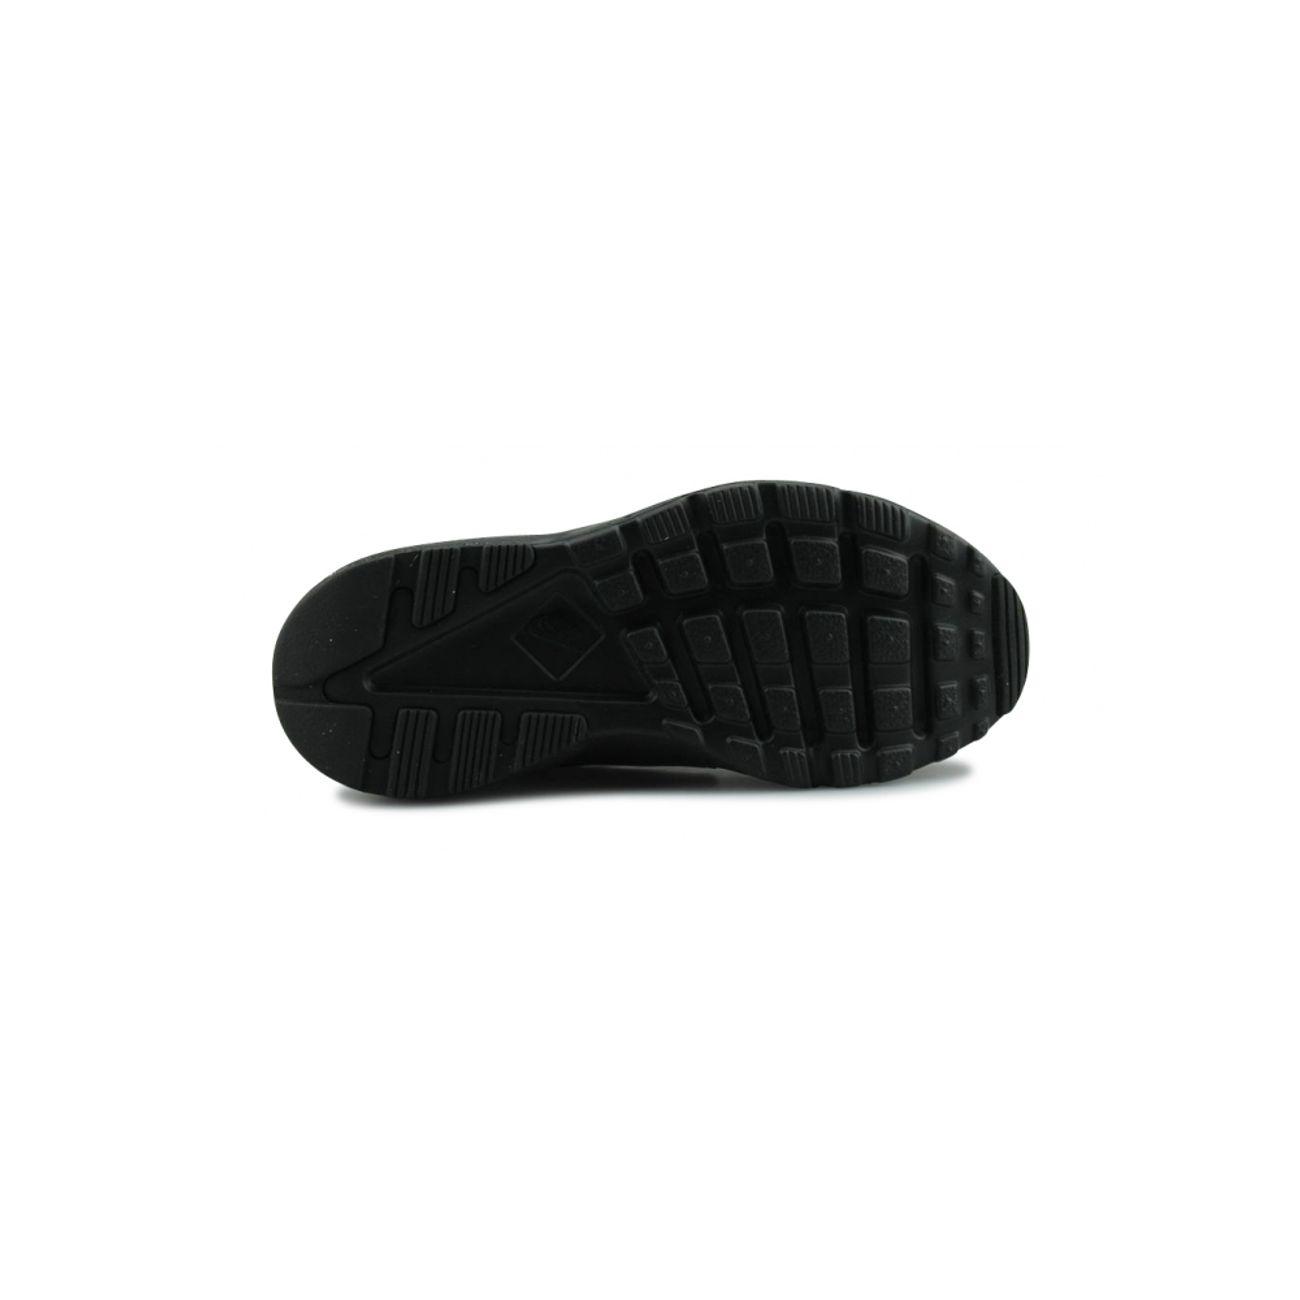 Mode- Lifestyle garçon NIKE Basket Nike Huarache Run Ultra Enfant Noir 859593-004